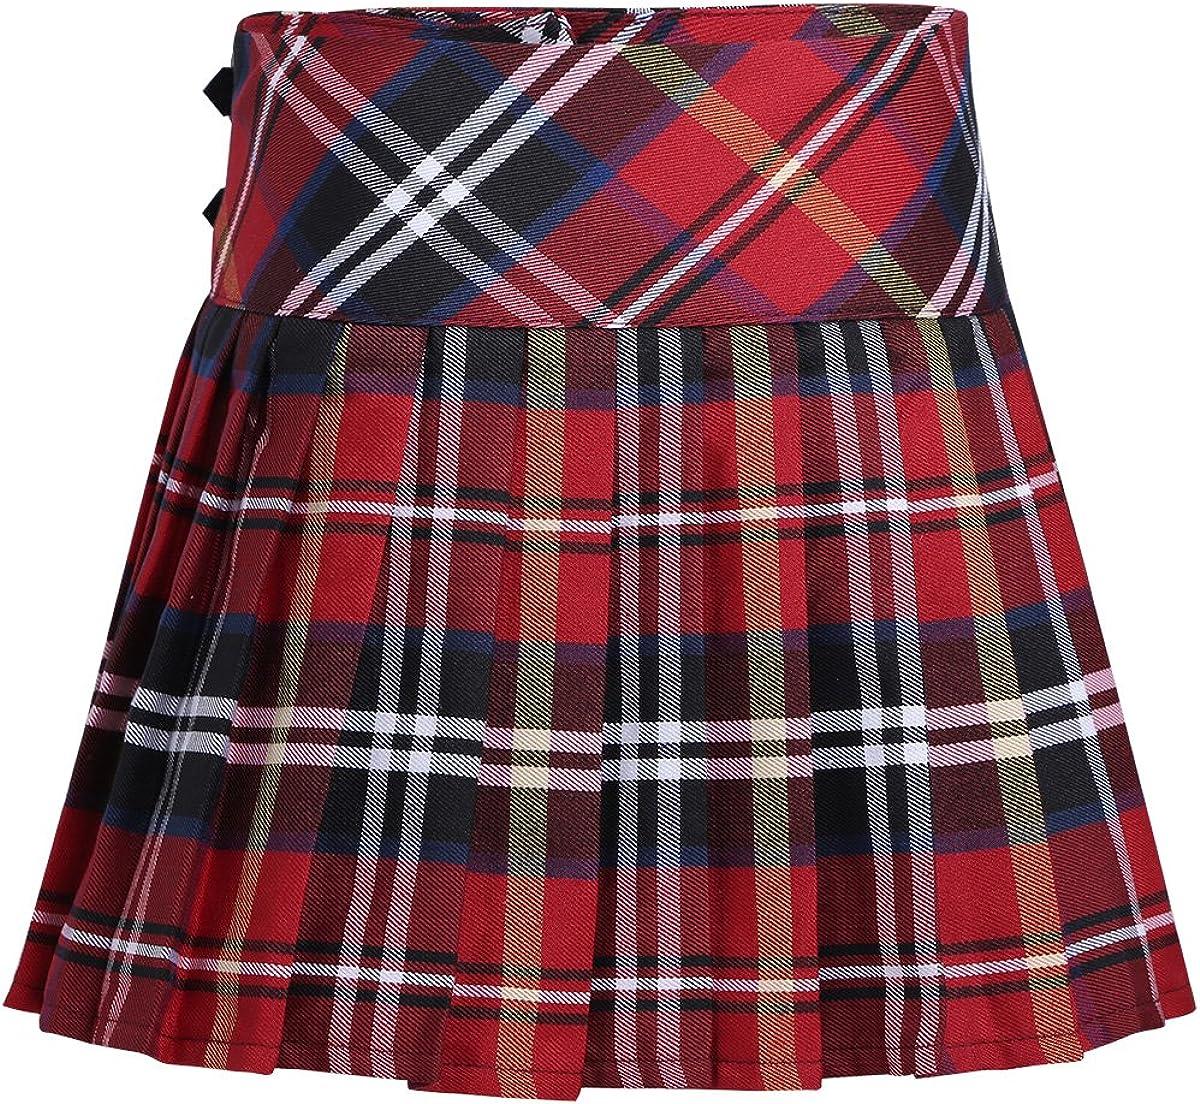 Agoky Falda Niña Ropa Verano Escocesas Cuadros Escocia Falda ...